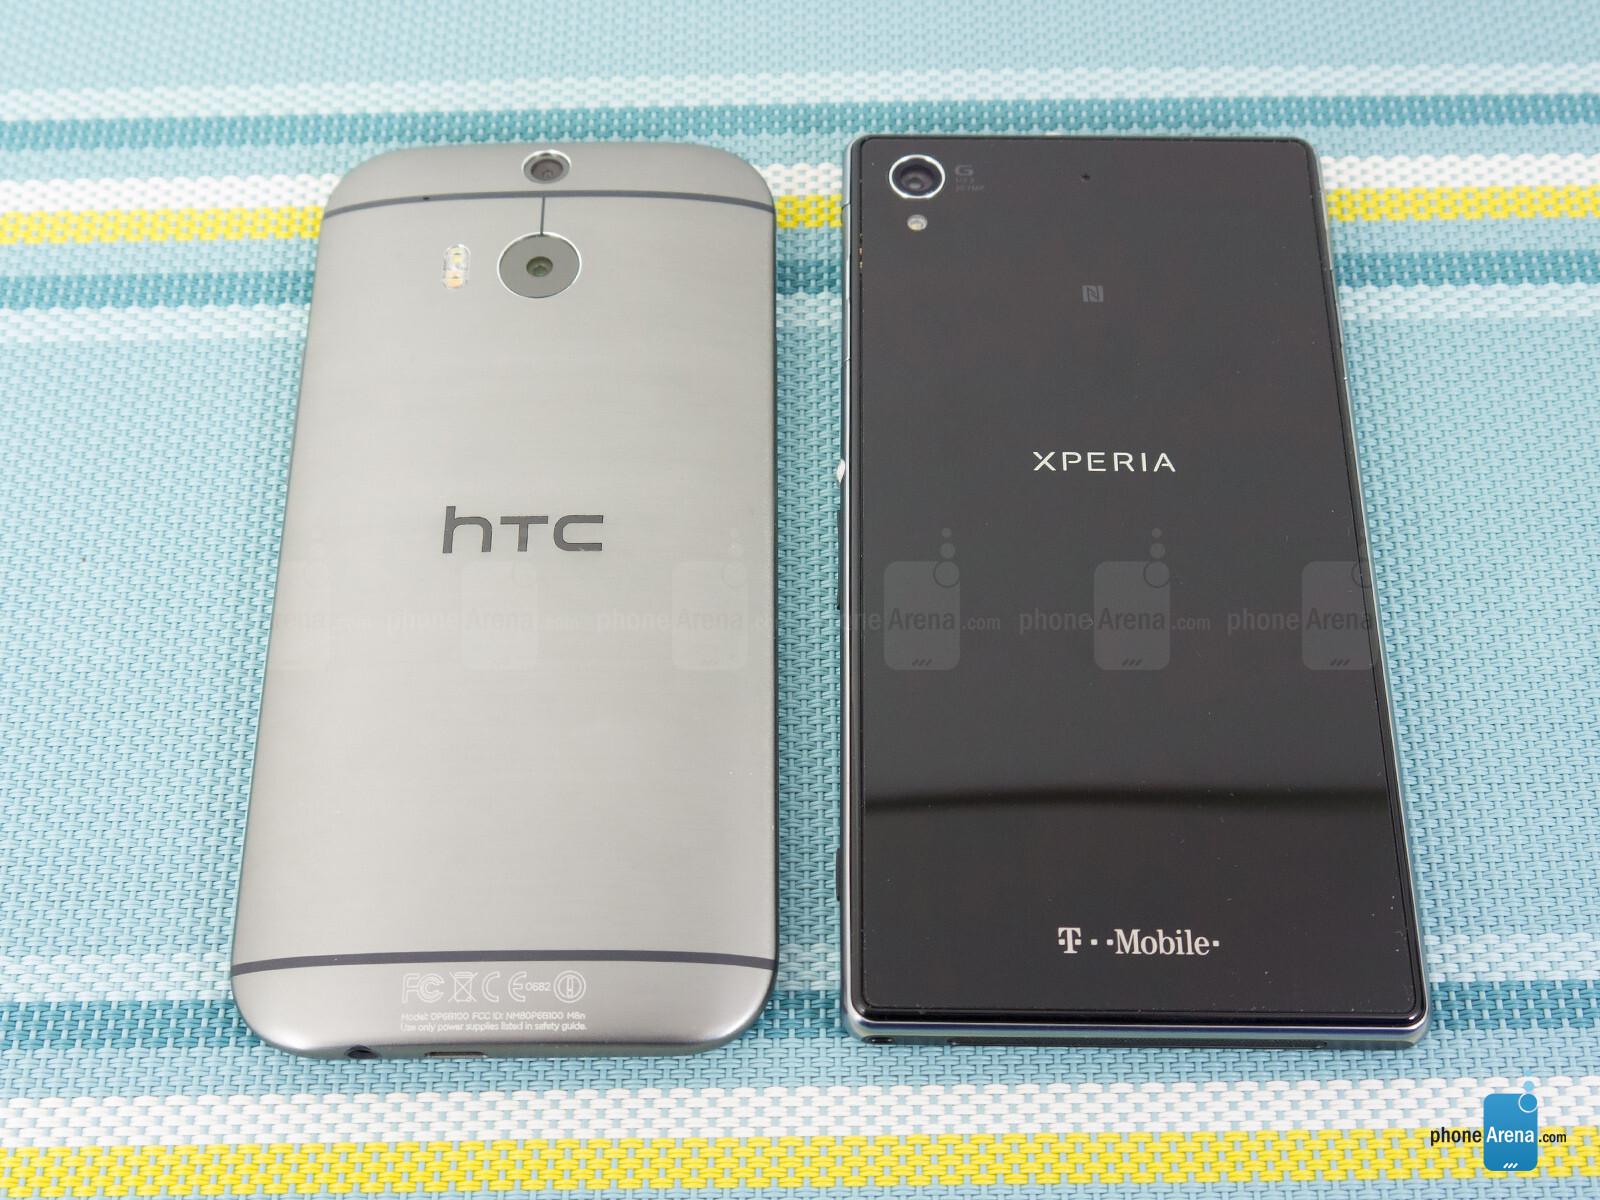 htc one s vs sony xperia s benchmark